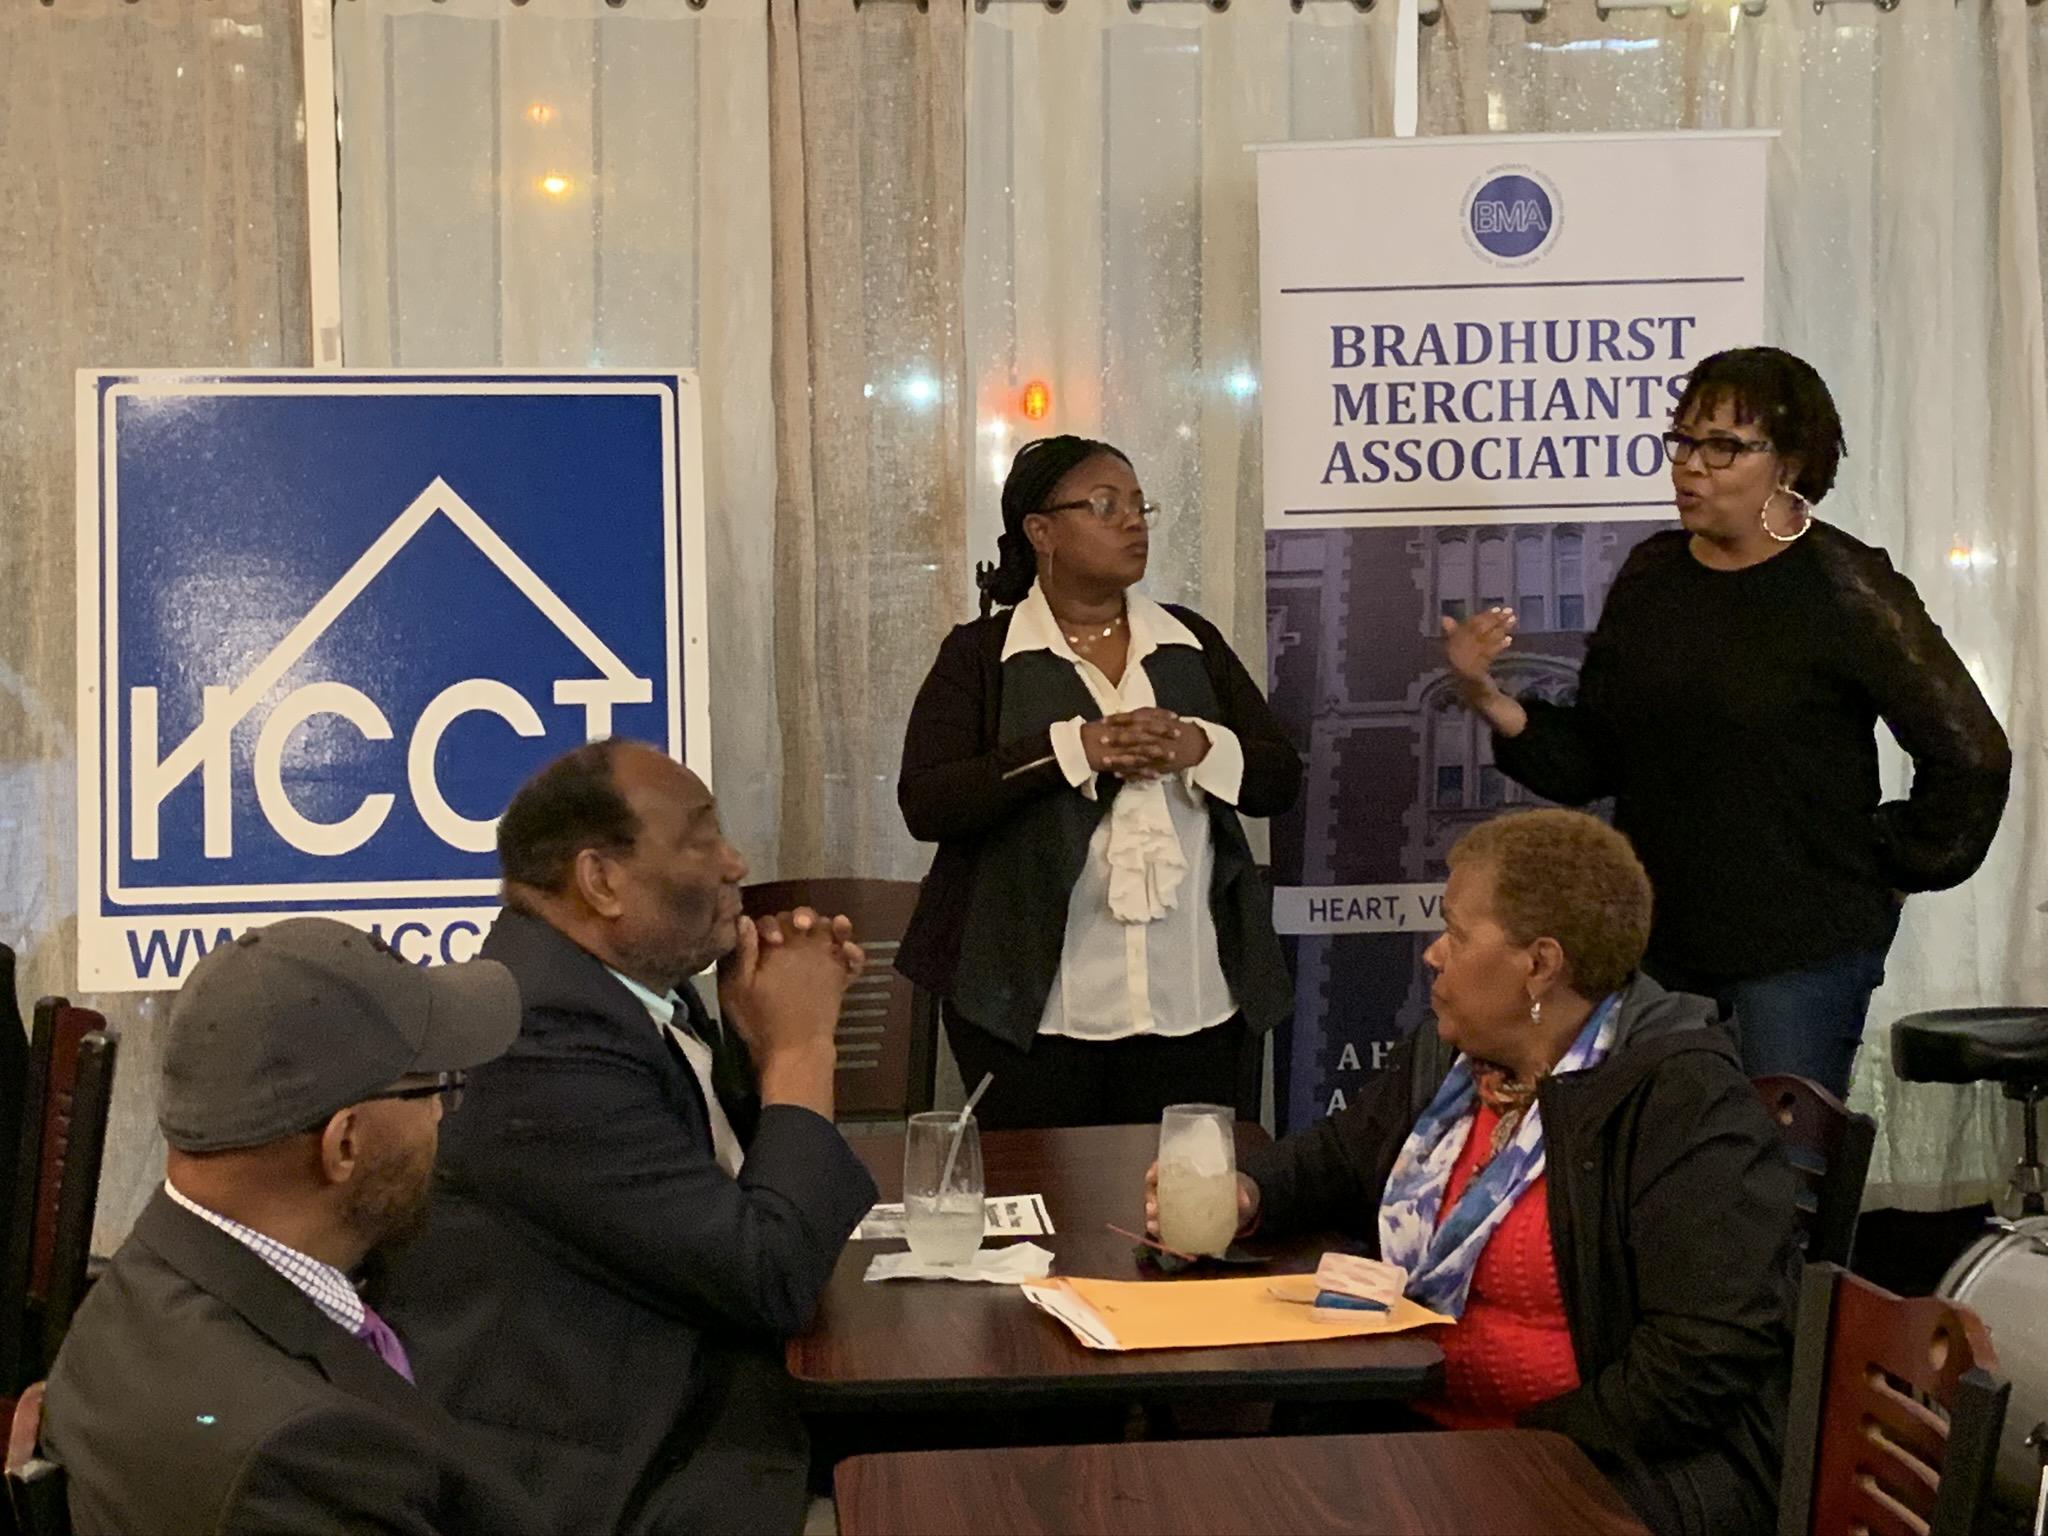 Bradhurst Merchant Association